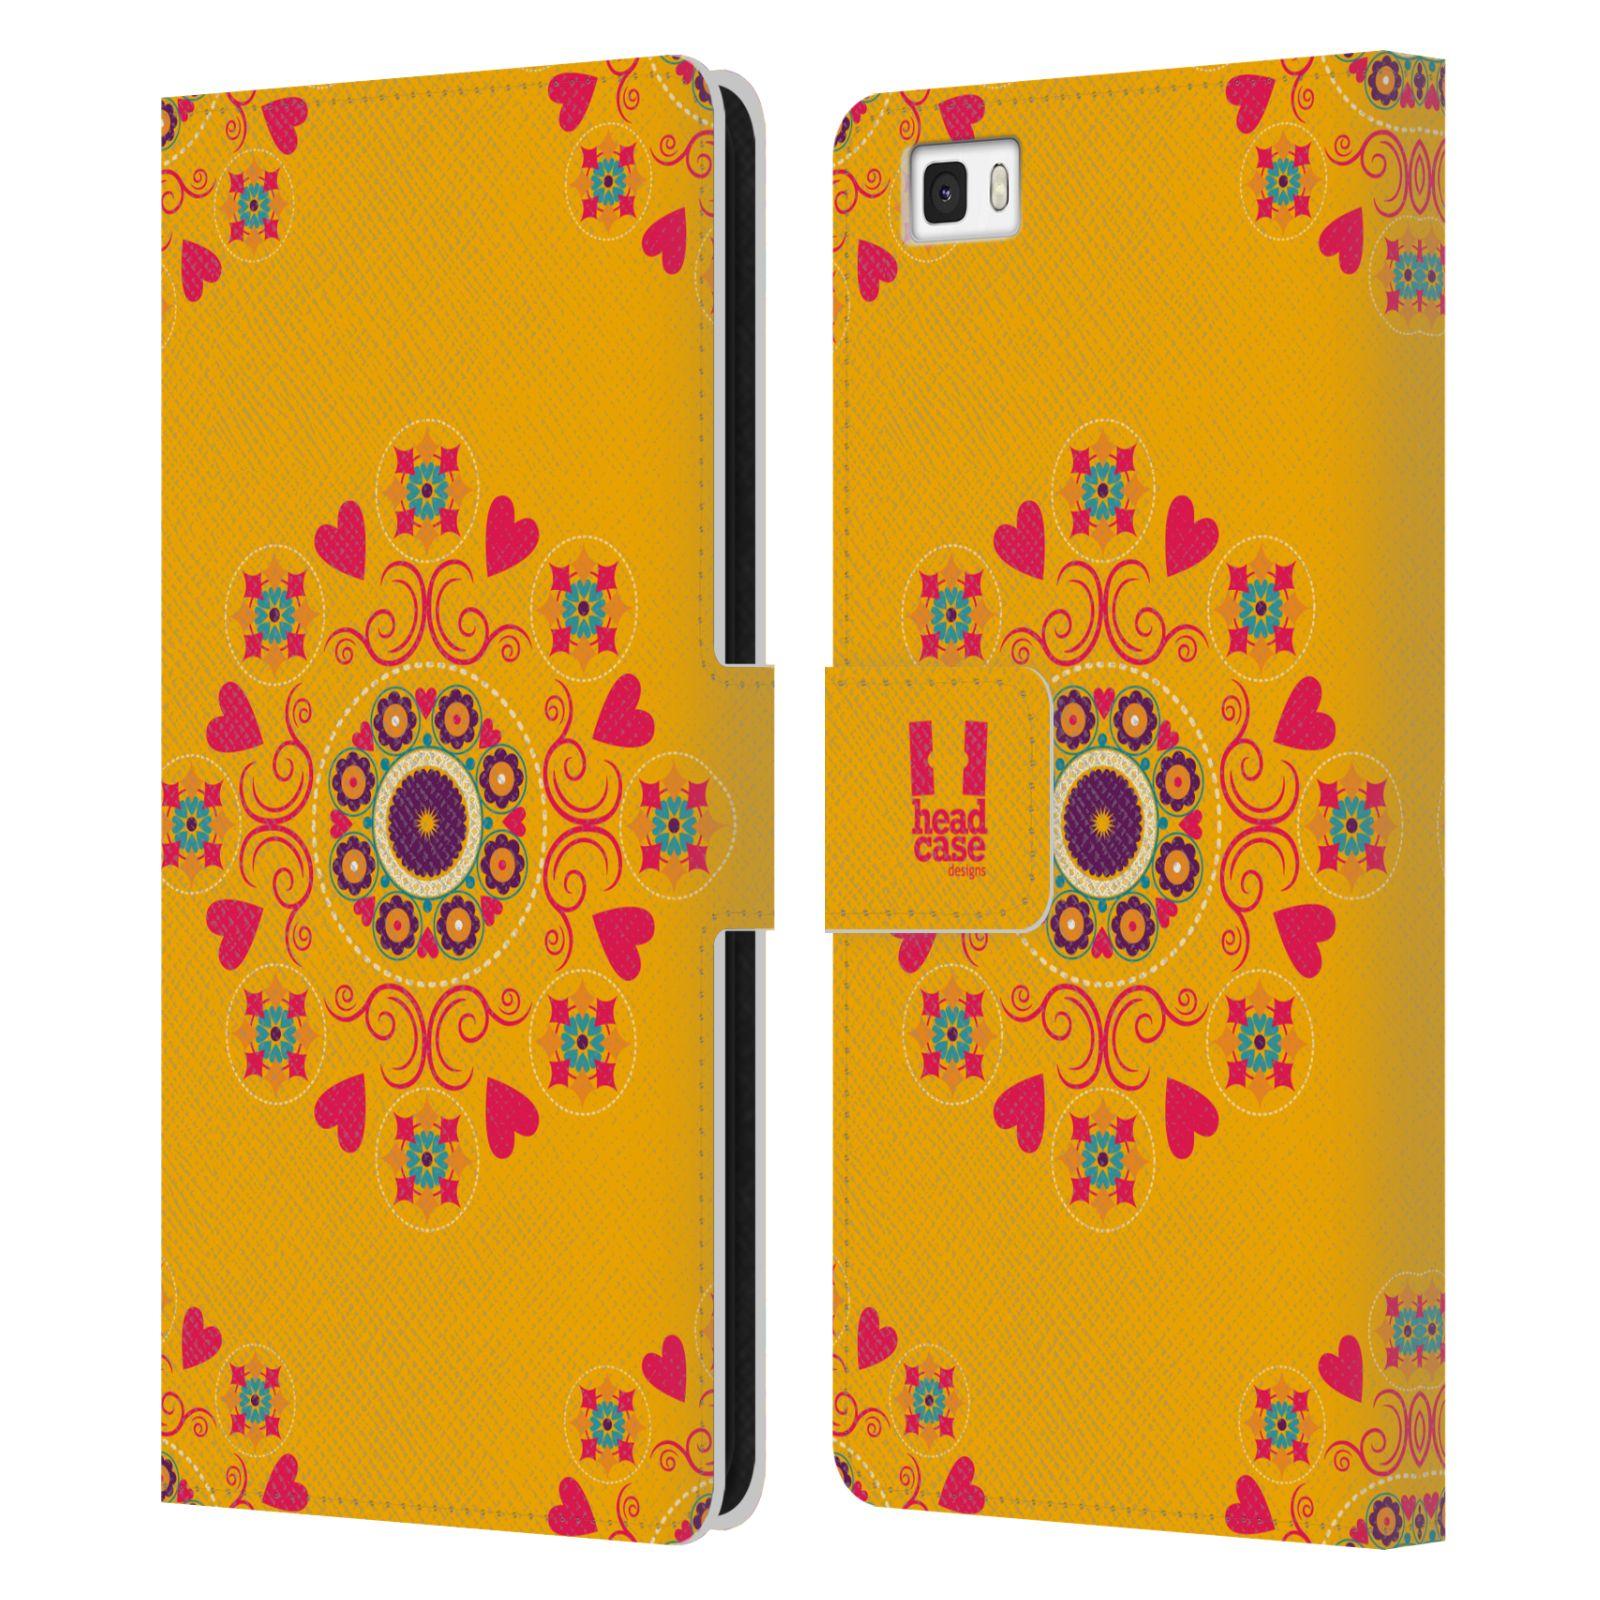 HEAD CASE Flipové pouzdro pro mobil Huawei P8 LITE Slovanský vzor květiny a srdíčka žlutá